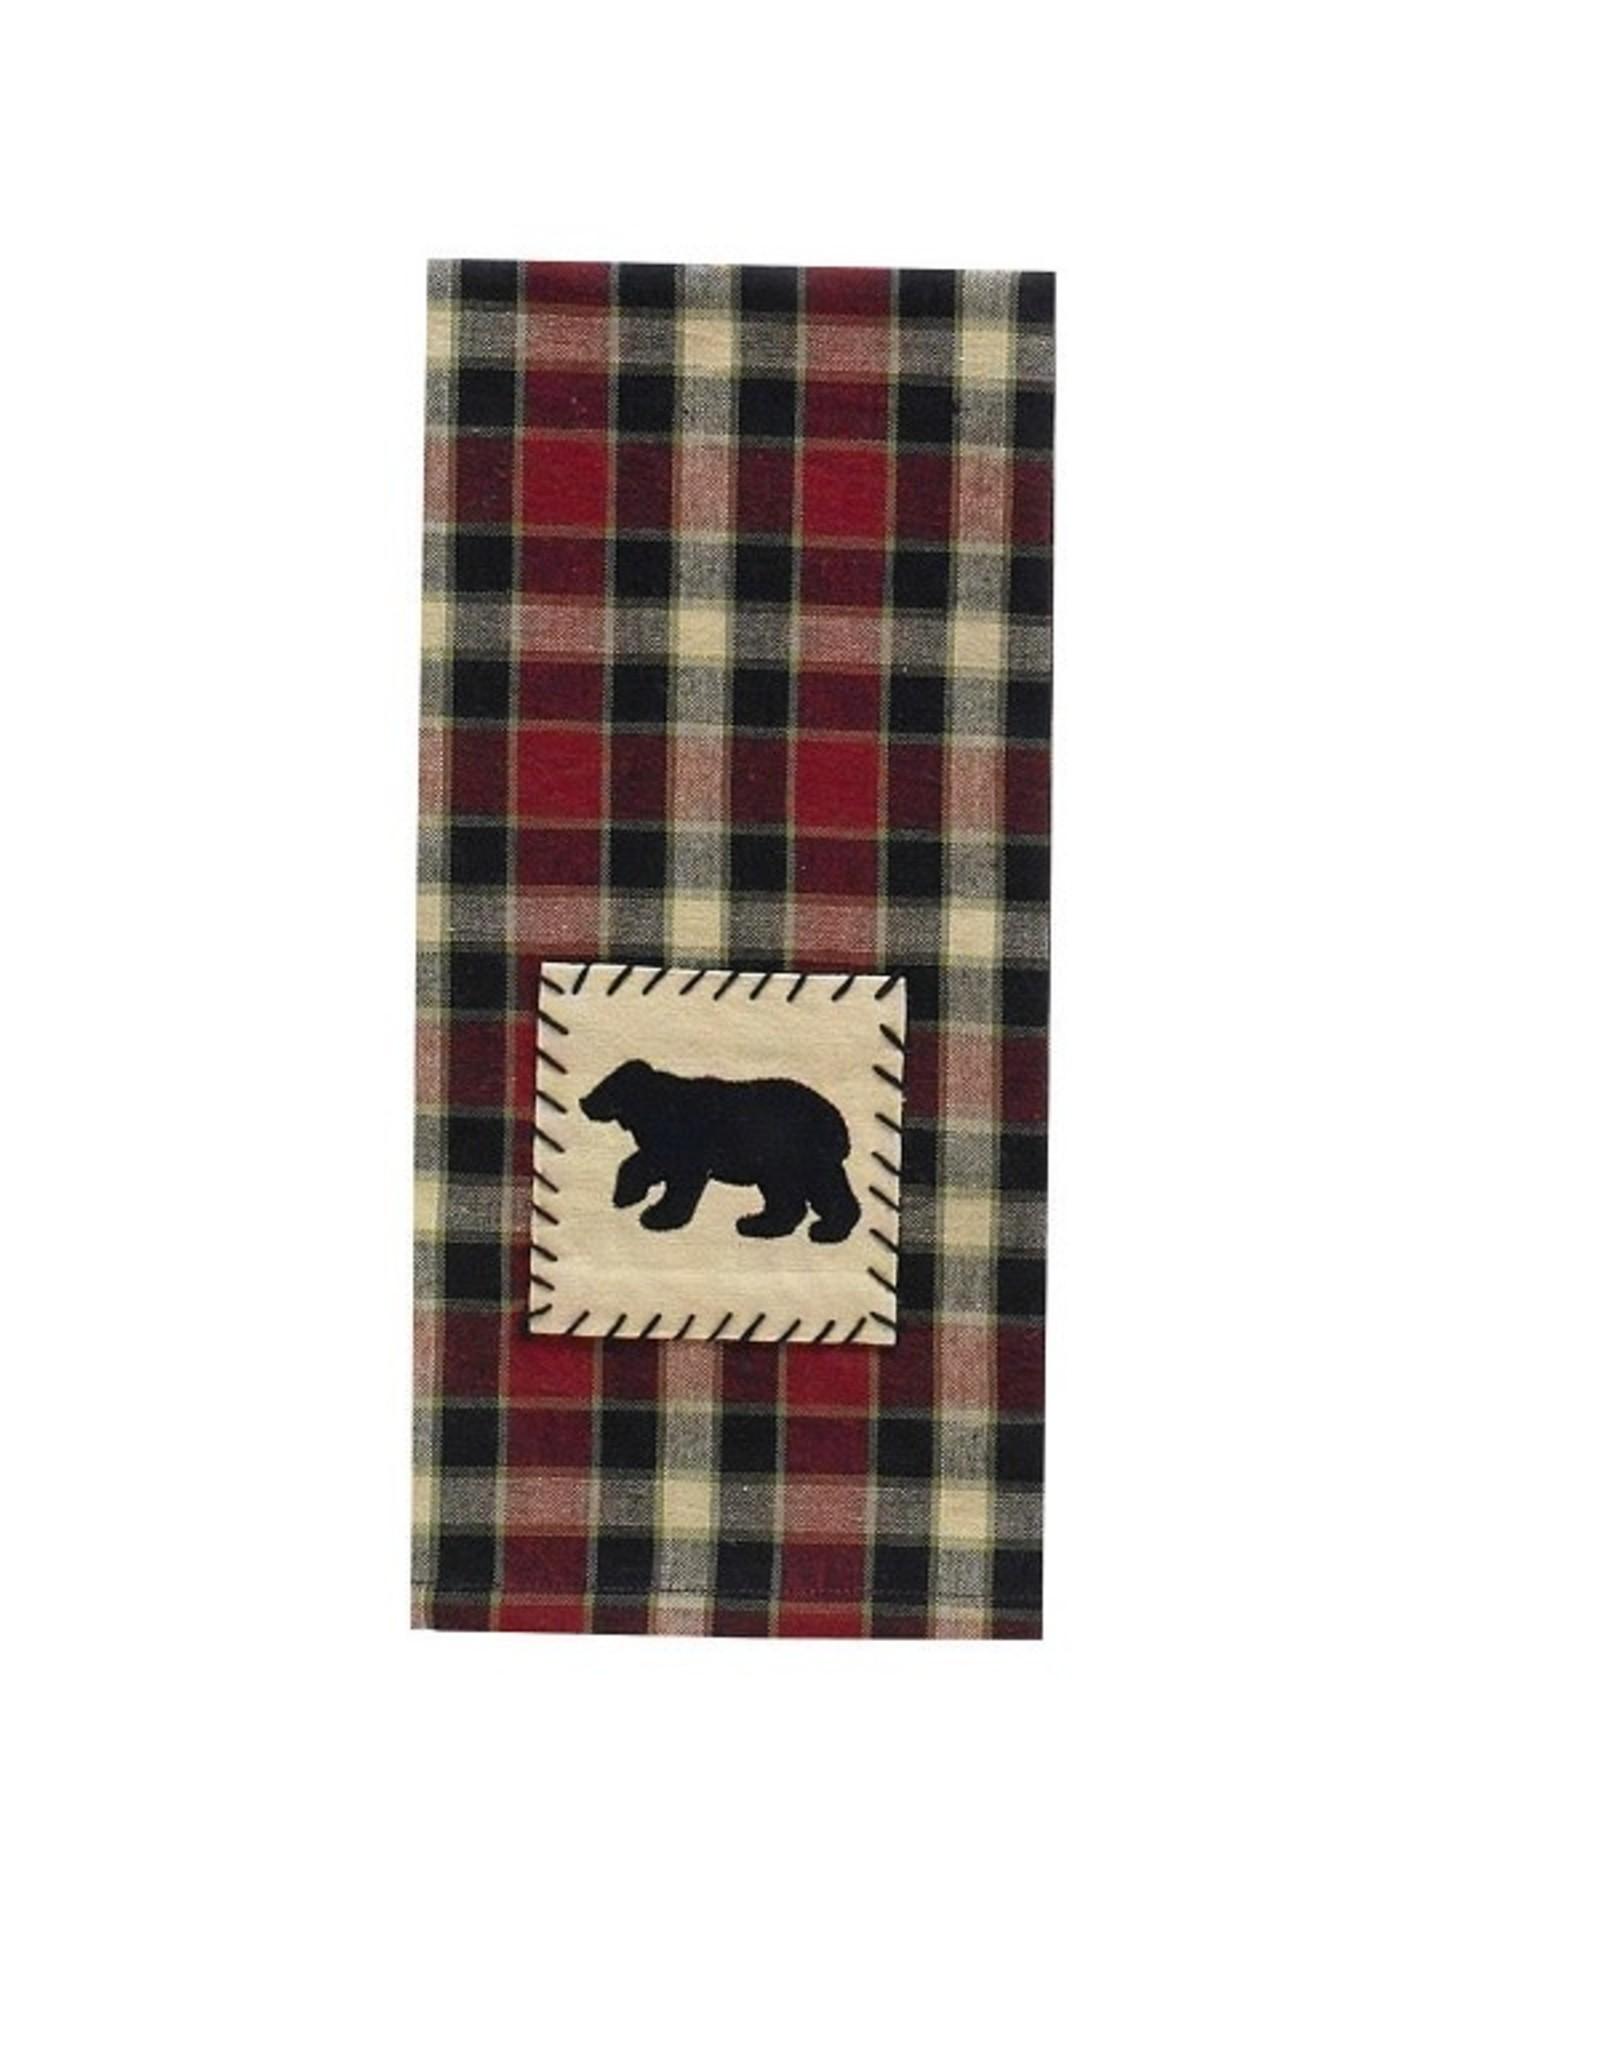 Park Designs CONCORD BEAR KITCHEN TOWEL